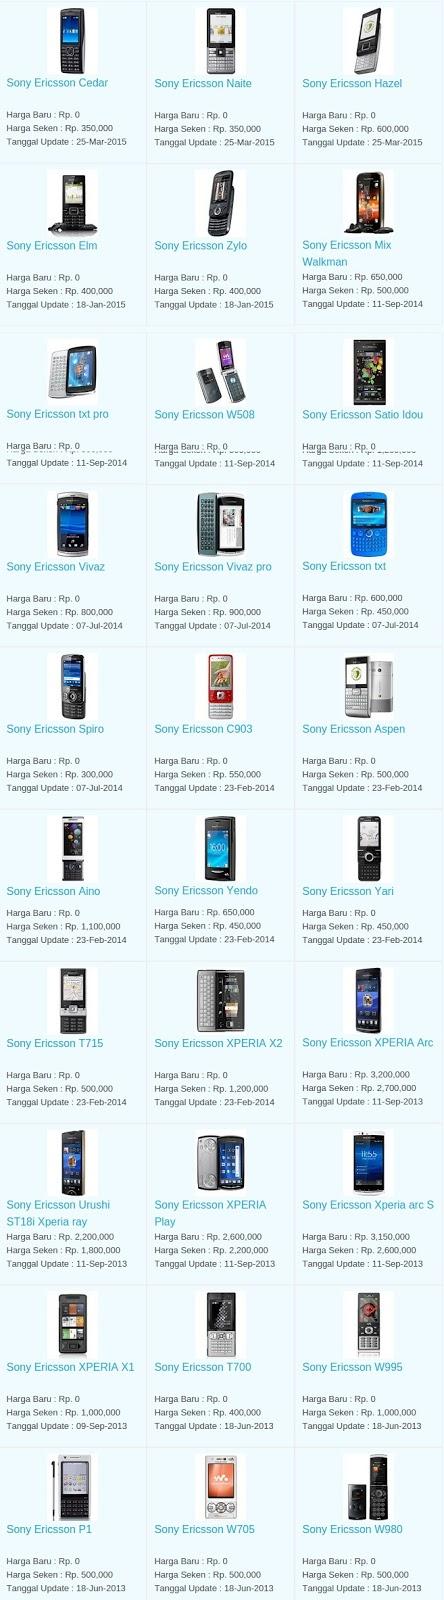 Daftar Harga Terbaru Hp Sony Ericsson Maret 2016